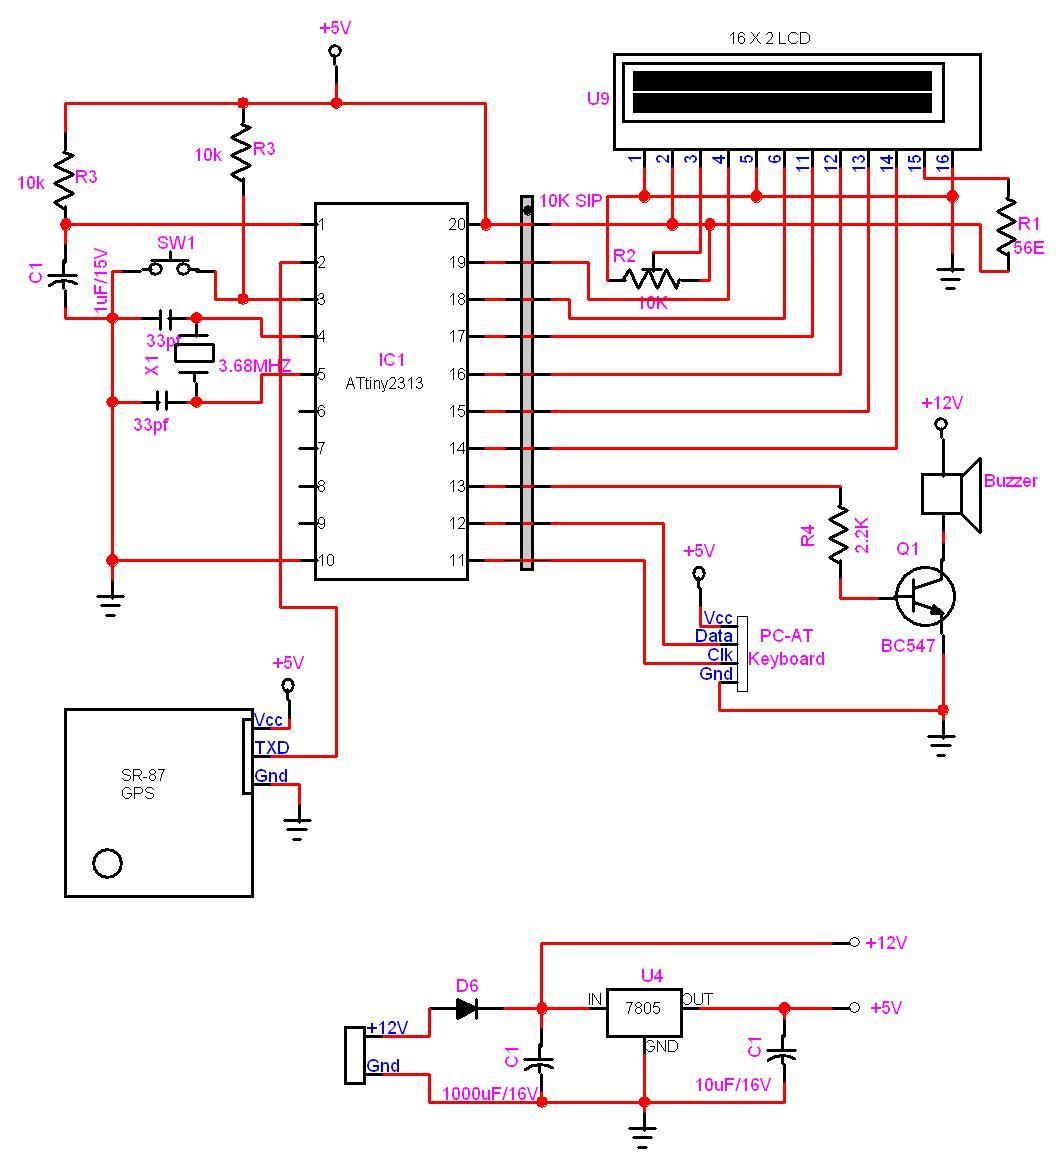 MMC card based WAV player using atmega32